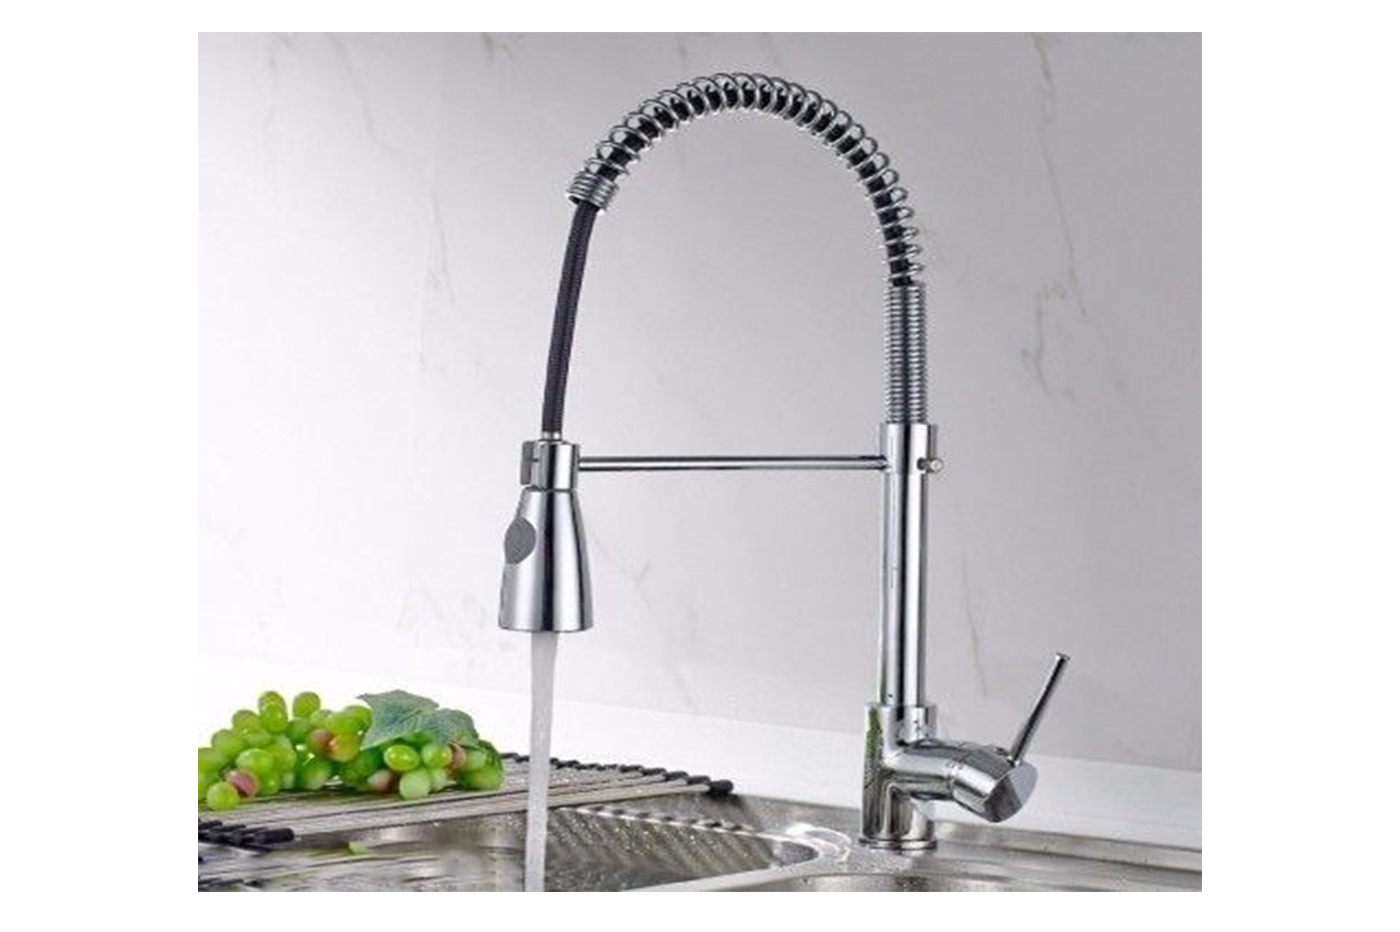 ᐅ miscelatori rubinetti colorati bianchi neri rossi ᐅ bagno